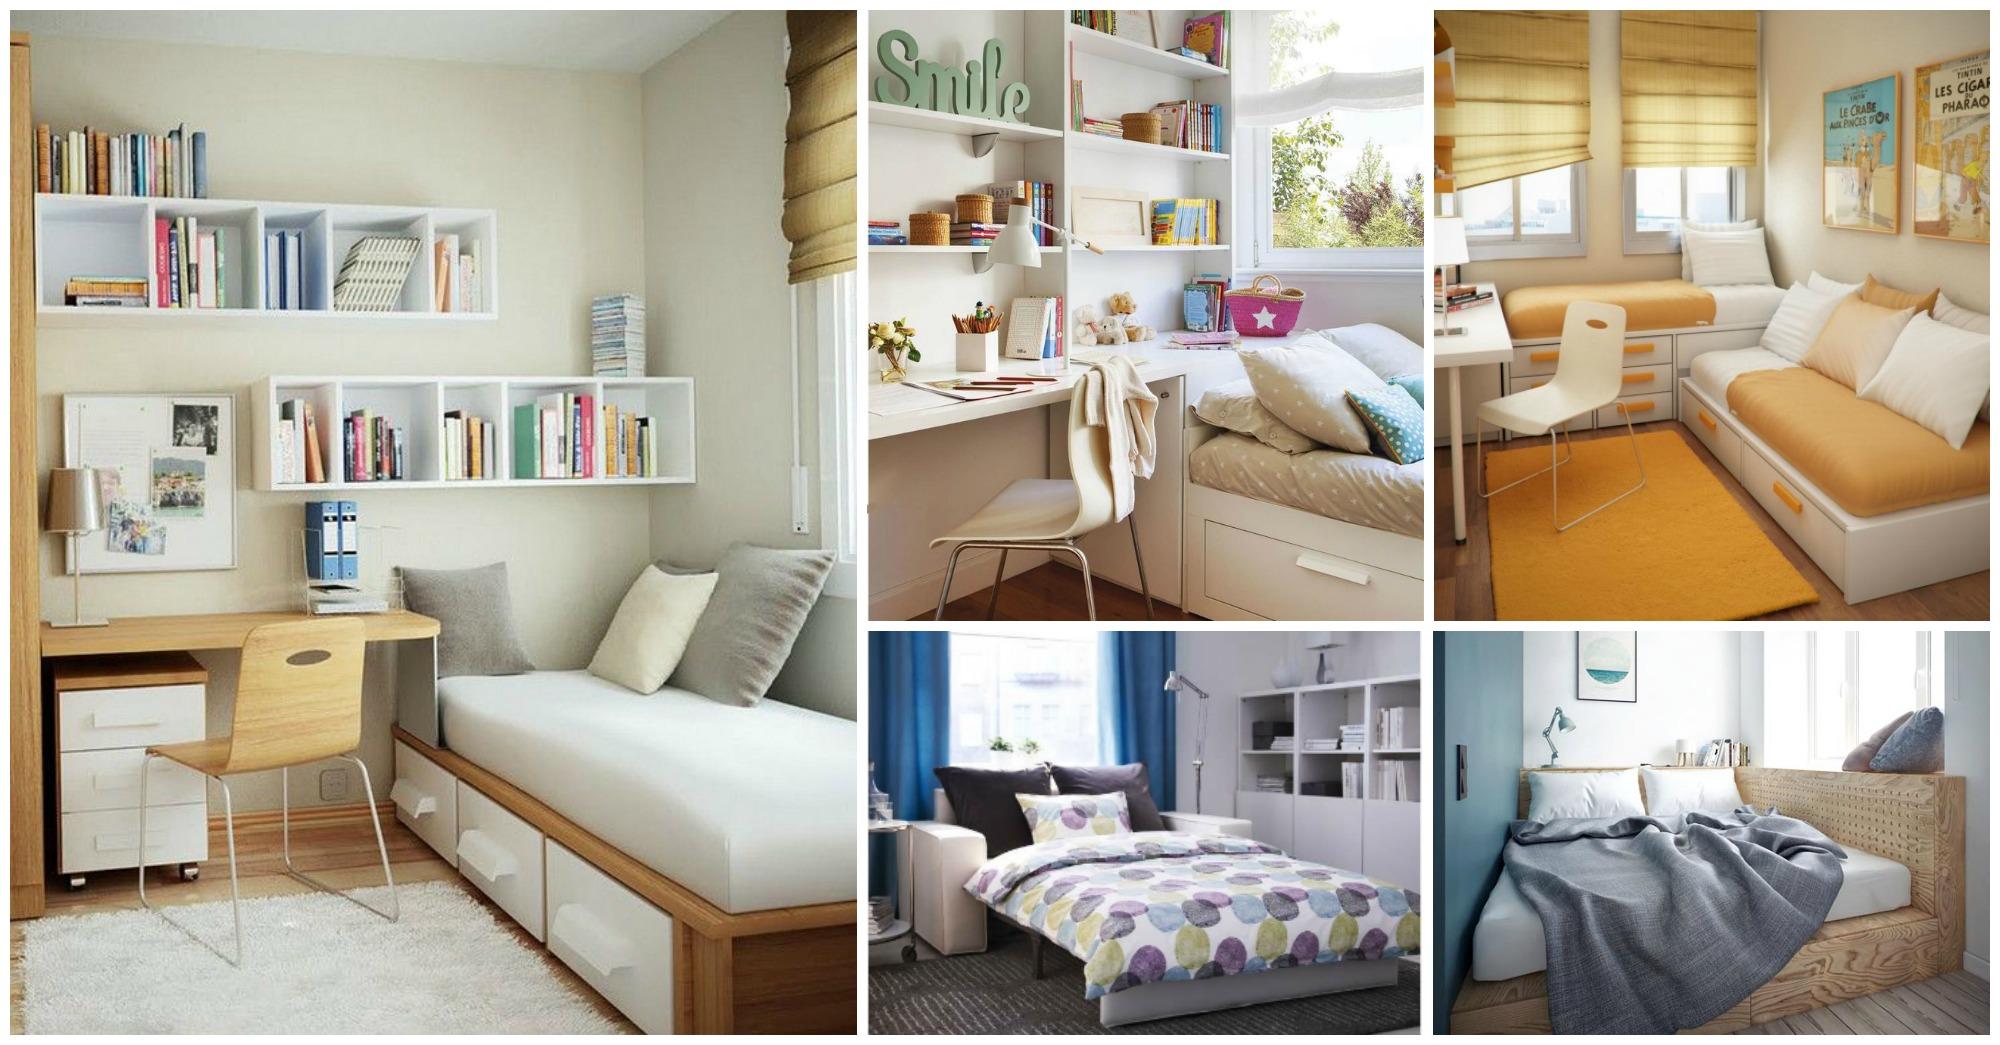 15 grandes ideas para dormitorios peque os muy acogedores - Ideas para trasteros pequenos ...